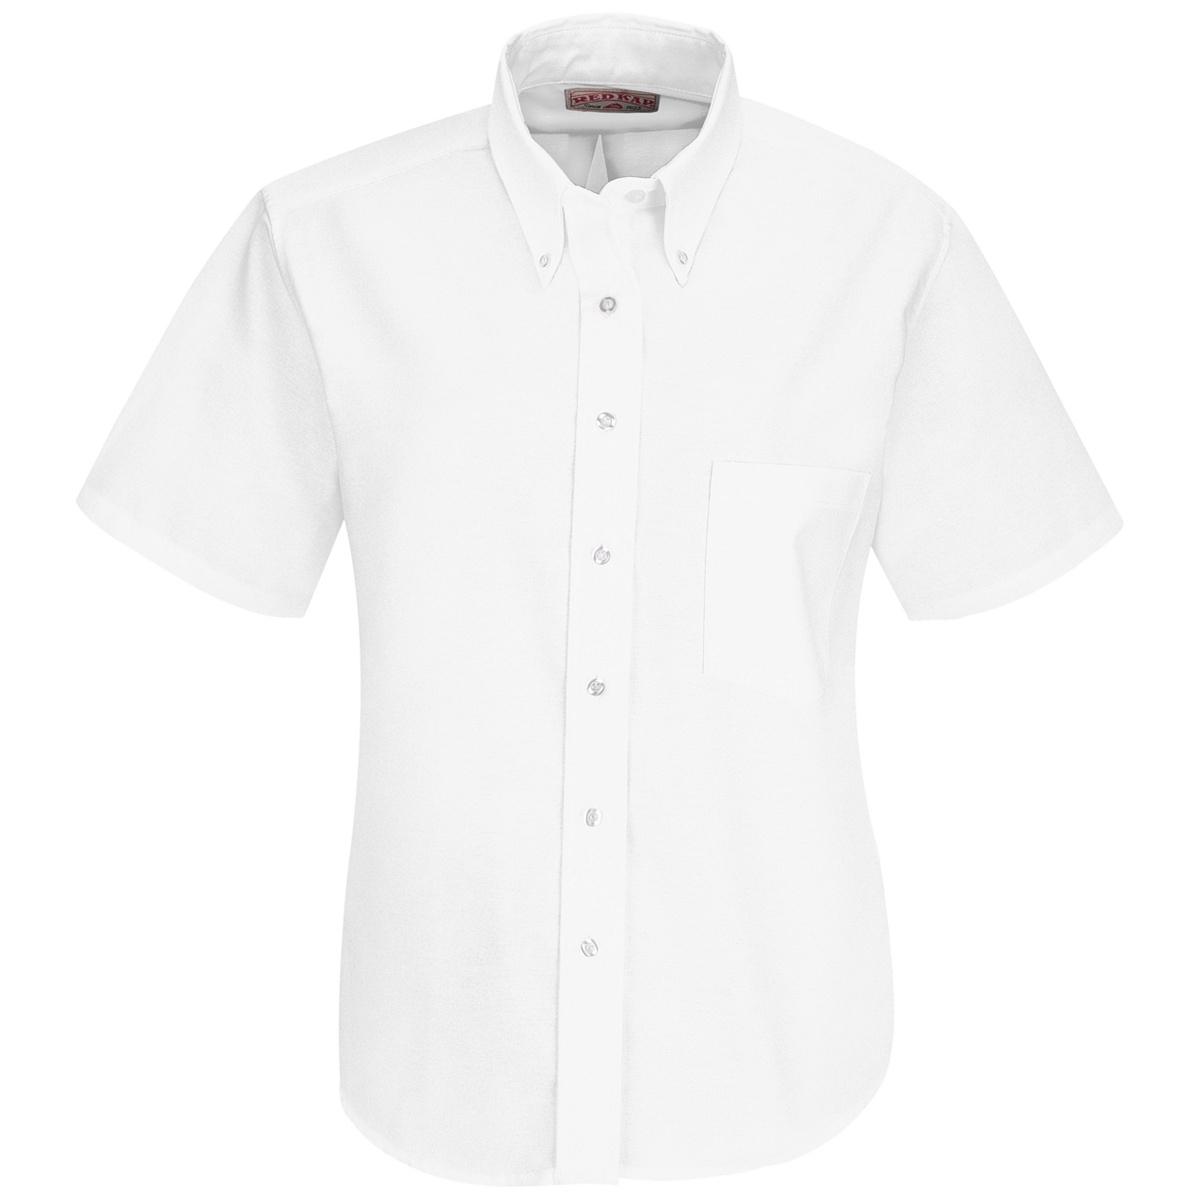 Red kap women 39 s executive oxford dress shirt short for Short sleeve white dress shirt